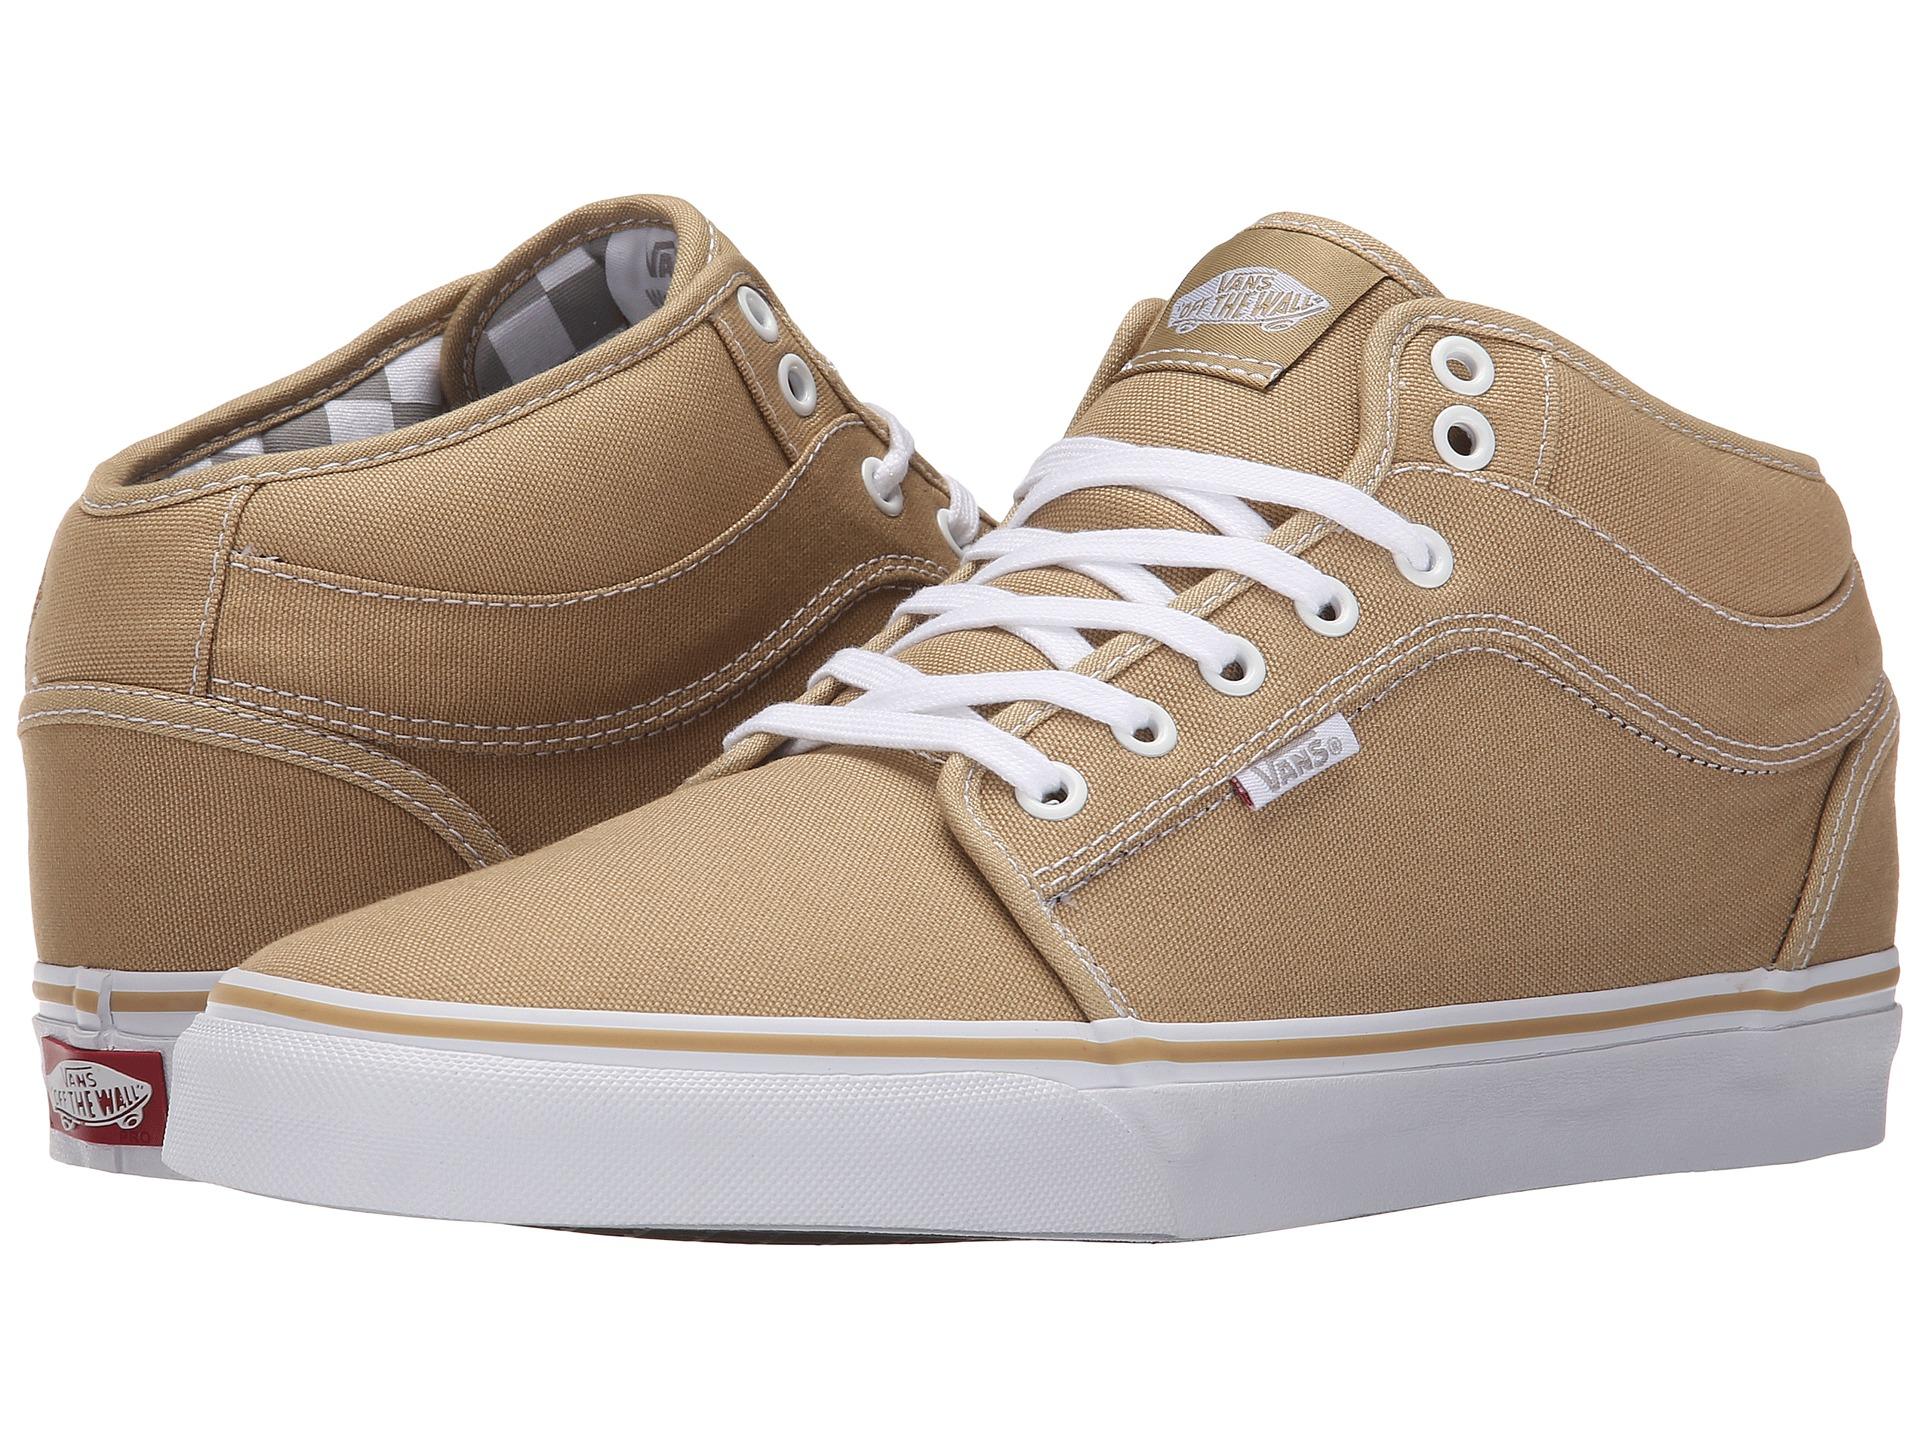 b9fbb3ed4626ec Lyst - Vans Chukka Mid Top in Brown for Men